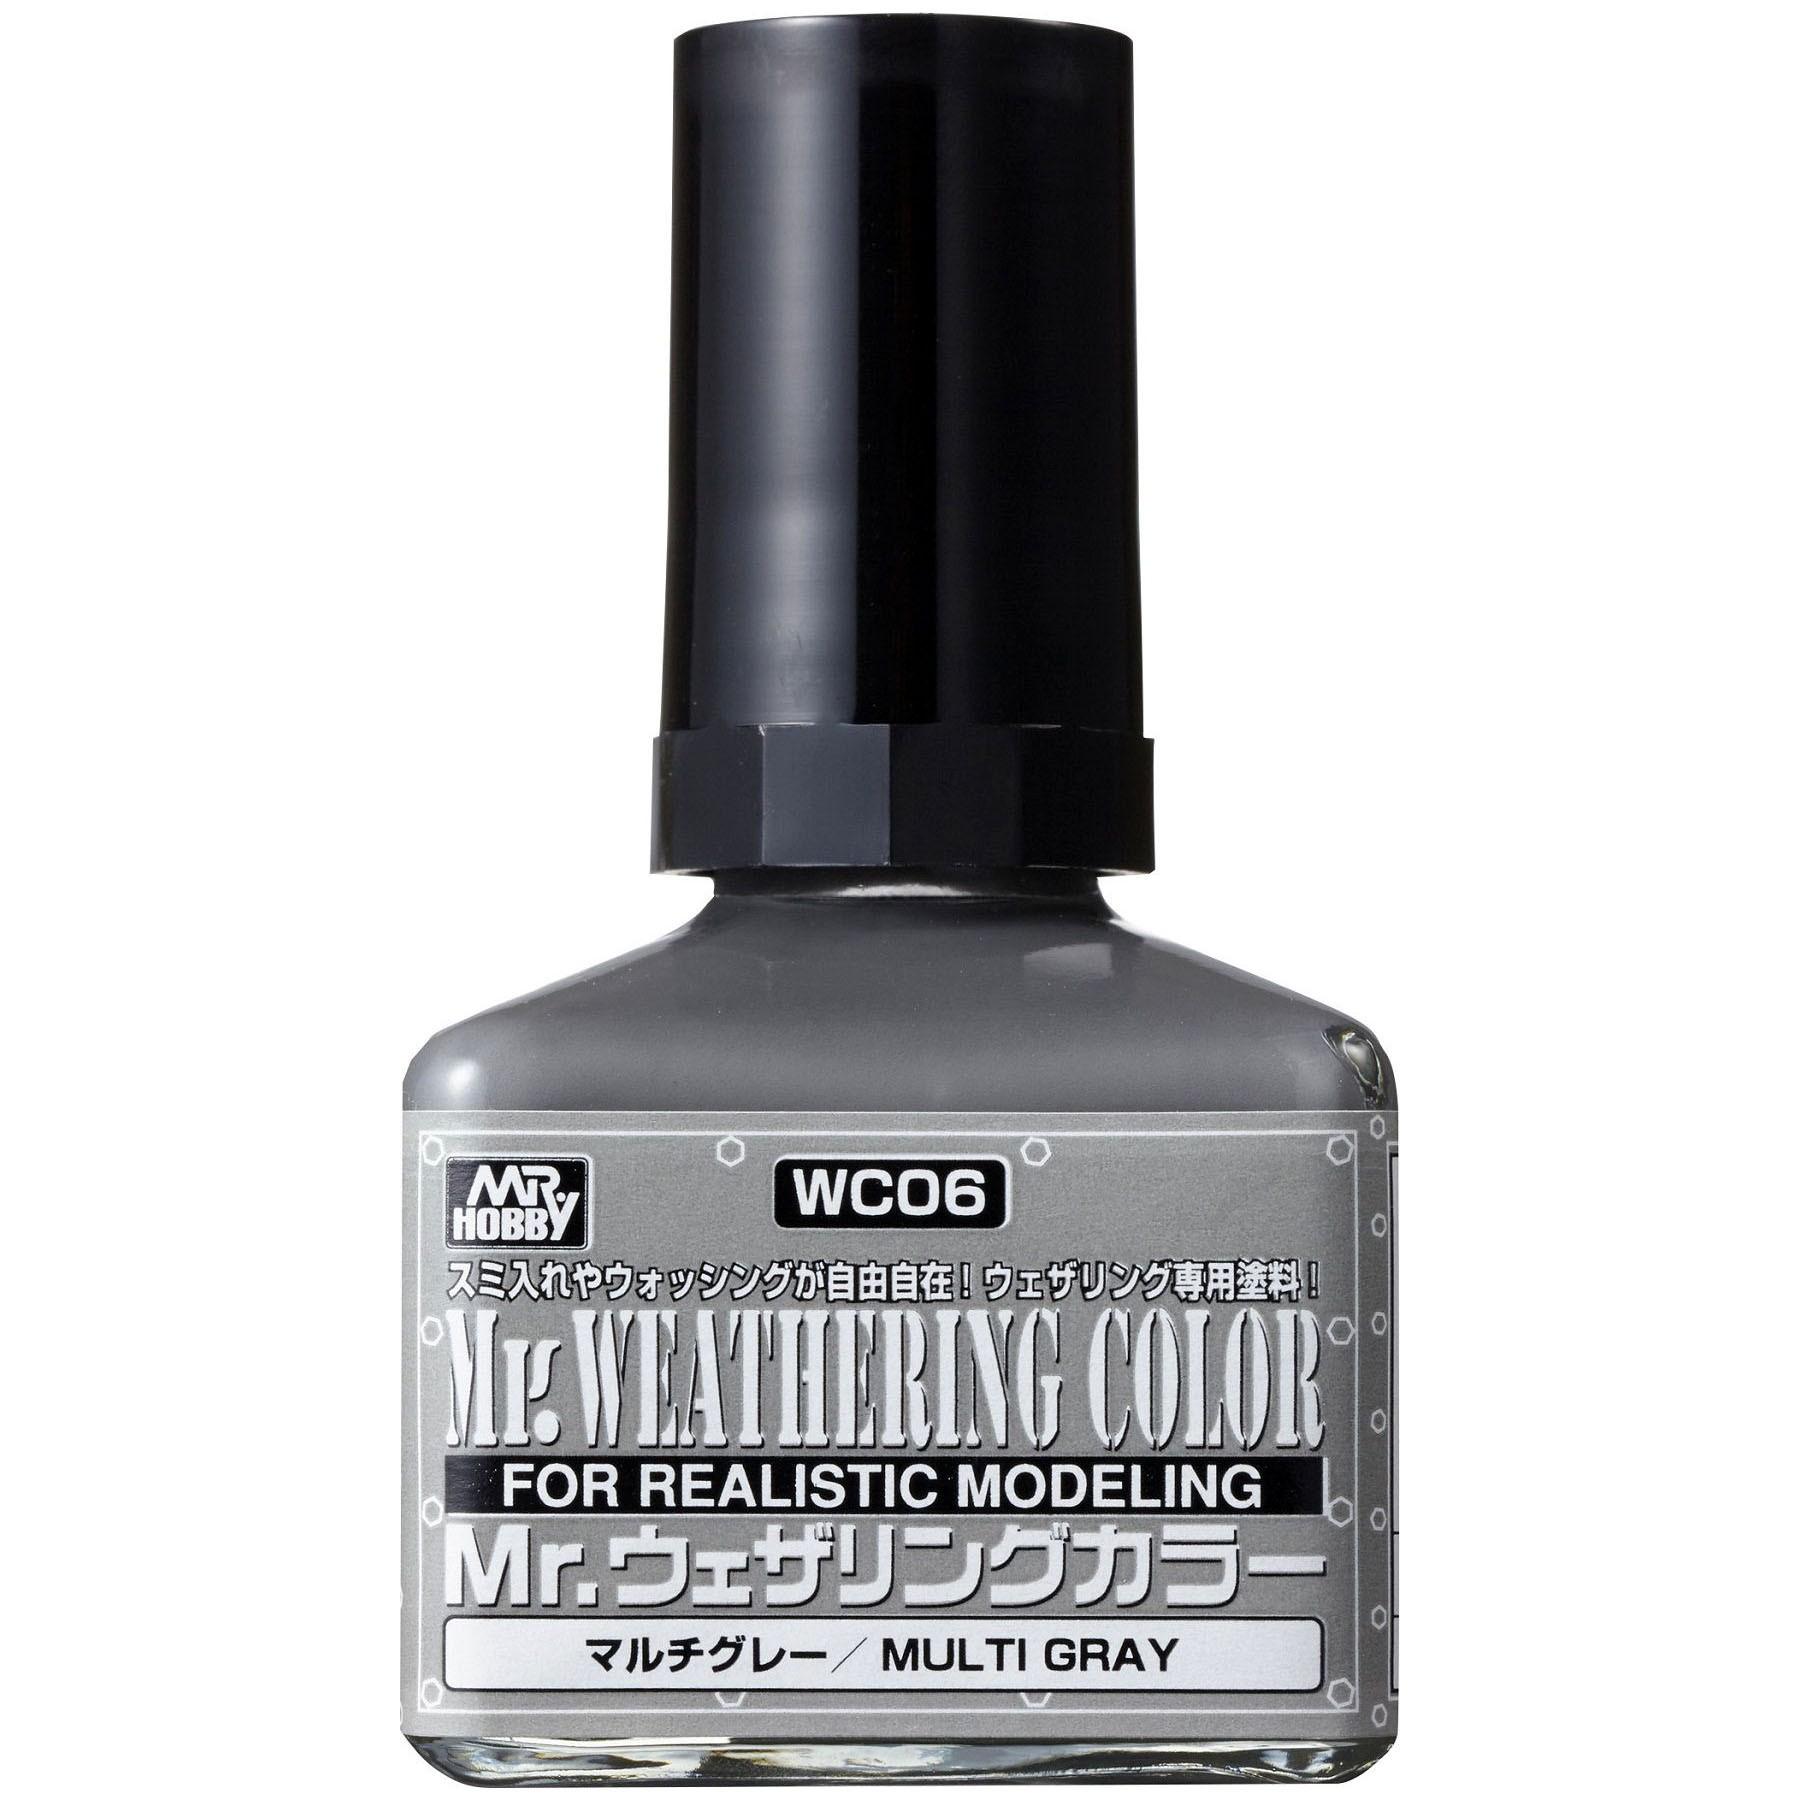 Mr.Weathering Color Multi Gray - Mr.Hobby WC06  - BLIMPS COMÉRCIO ELETRÔNICO